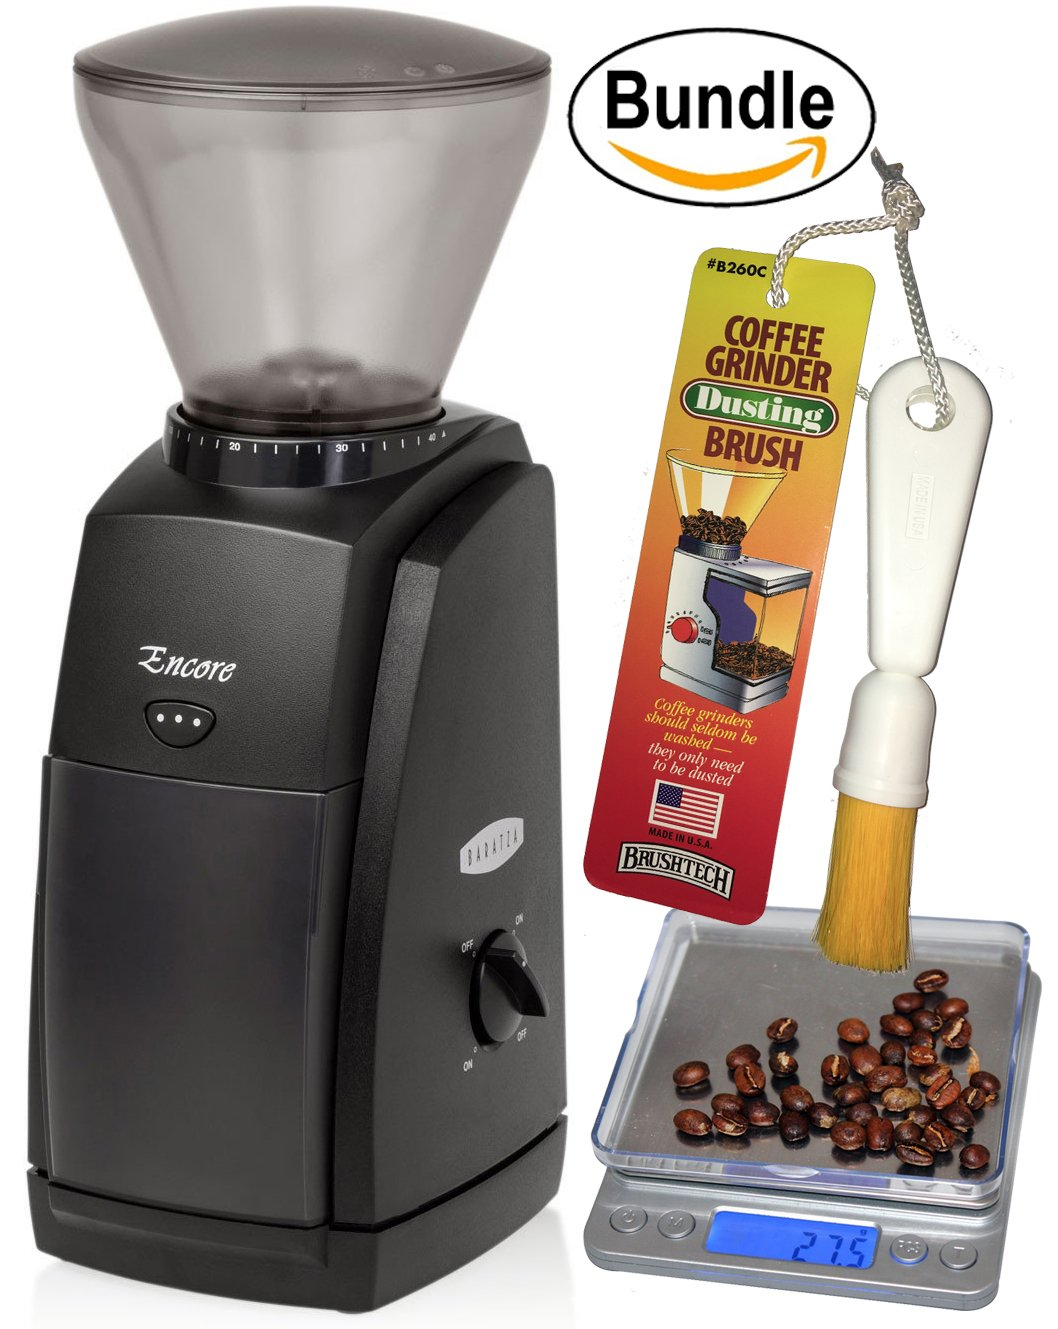 Baratza Encore Conical Burr Coffee Grinder, CoastLine Digital Kitchen Scale, and Coffee Grinder Brush by Baratza